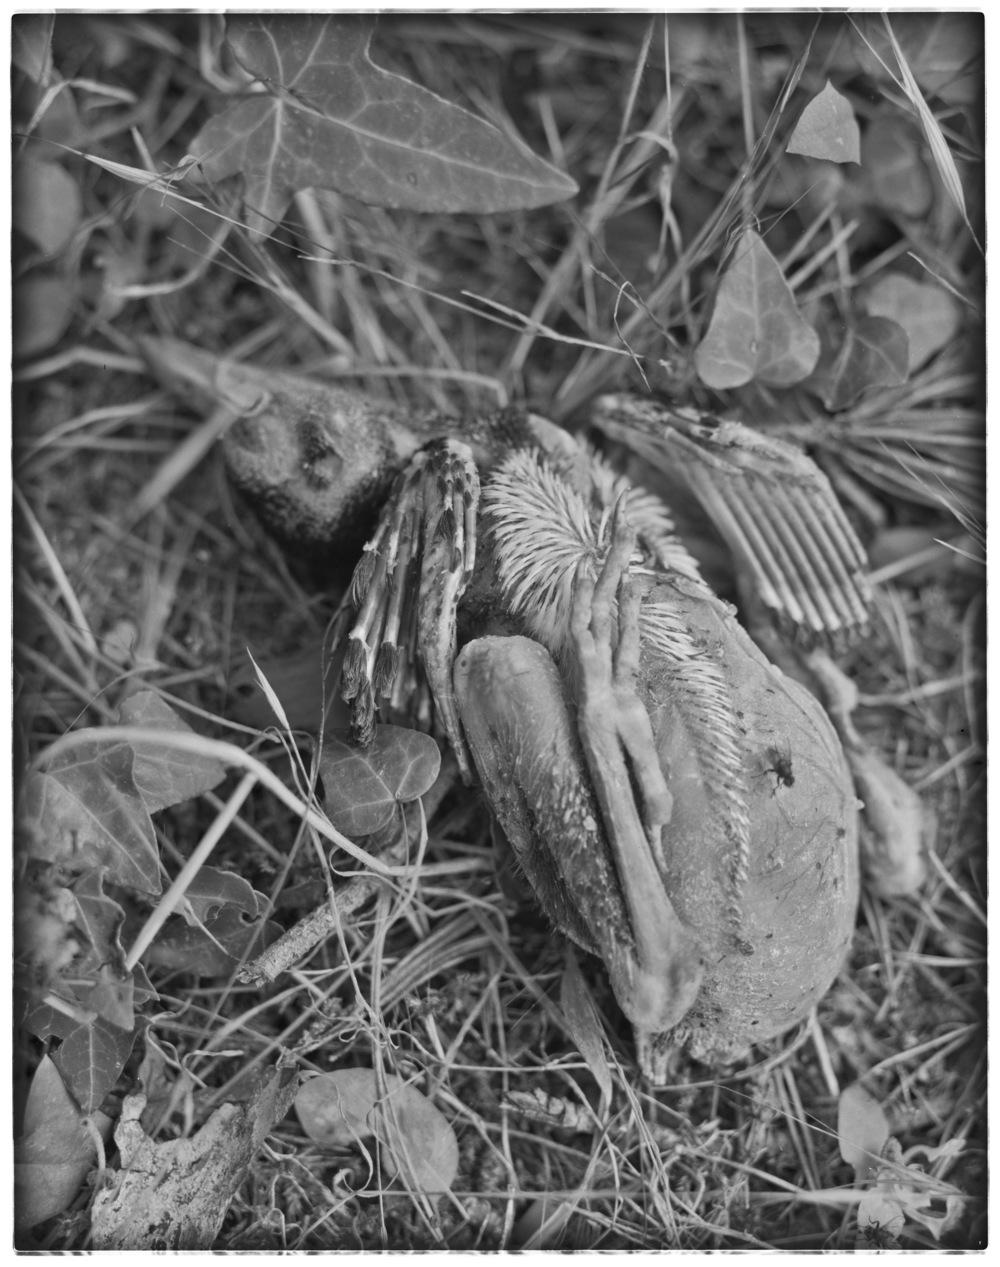 lydiasee_090814-deadbird1-2014-4x5_summer022